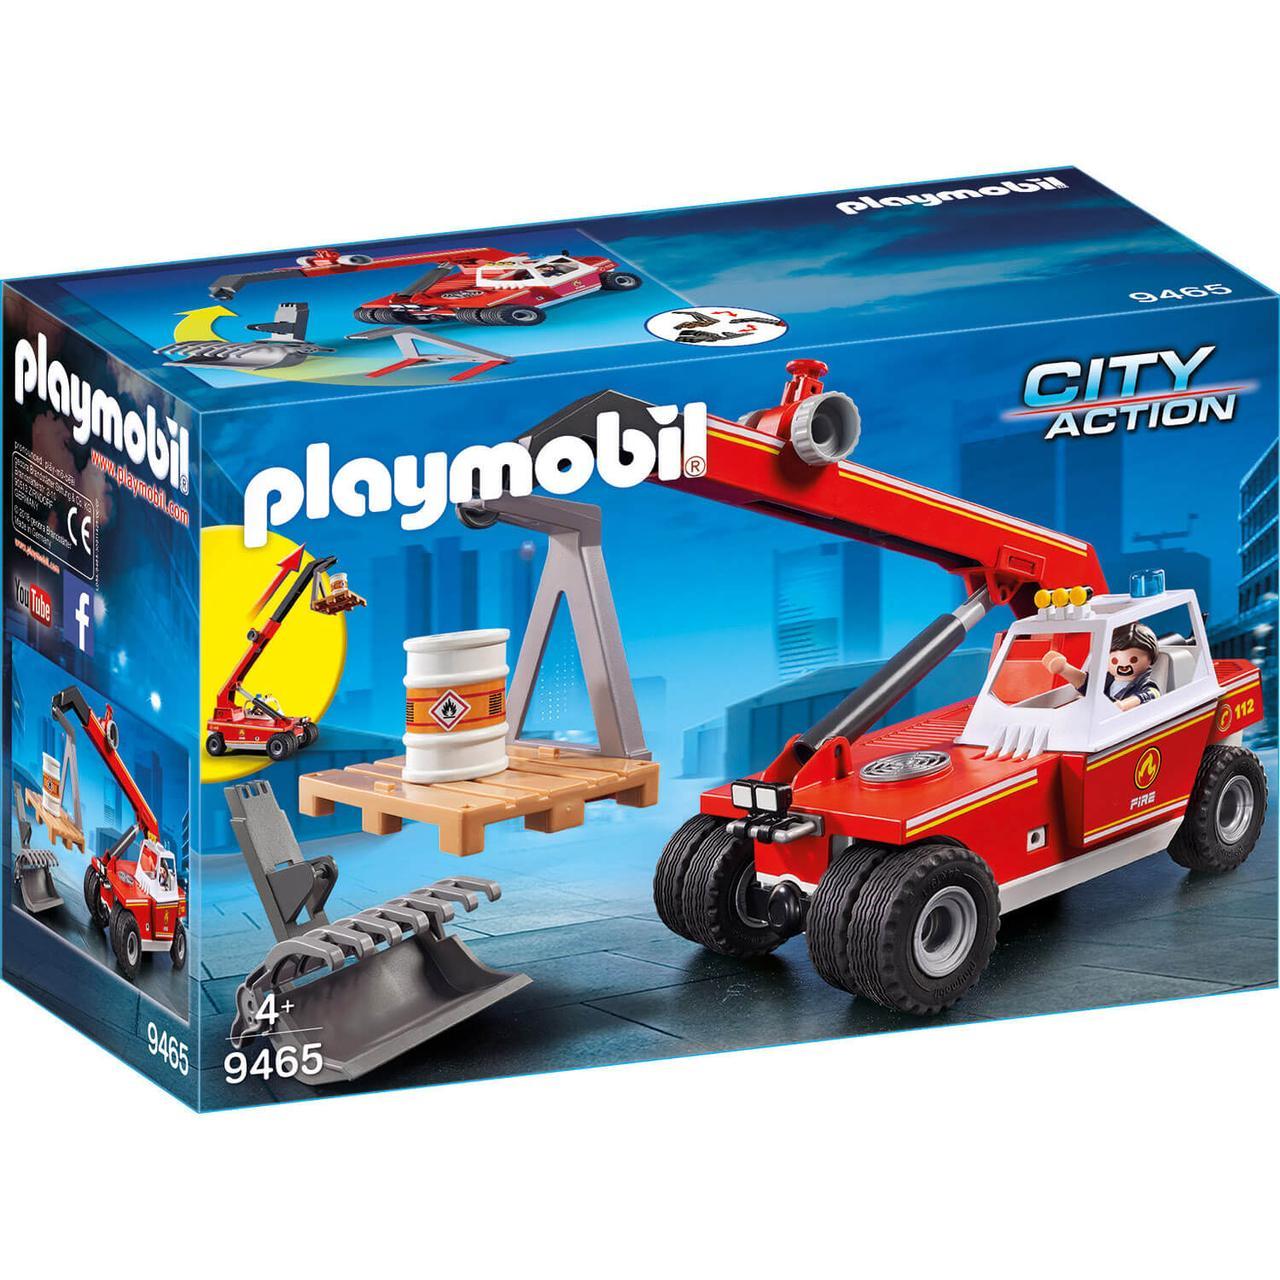 Конструктор Playmobil Пожарная служба: Пожарный Кран 9465pm - фото 1